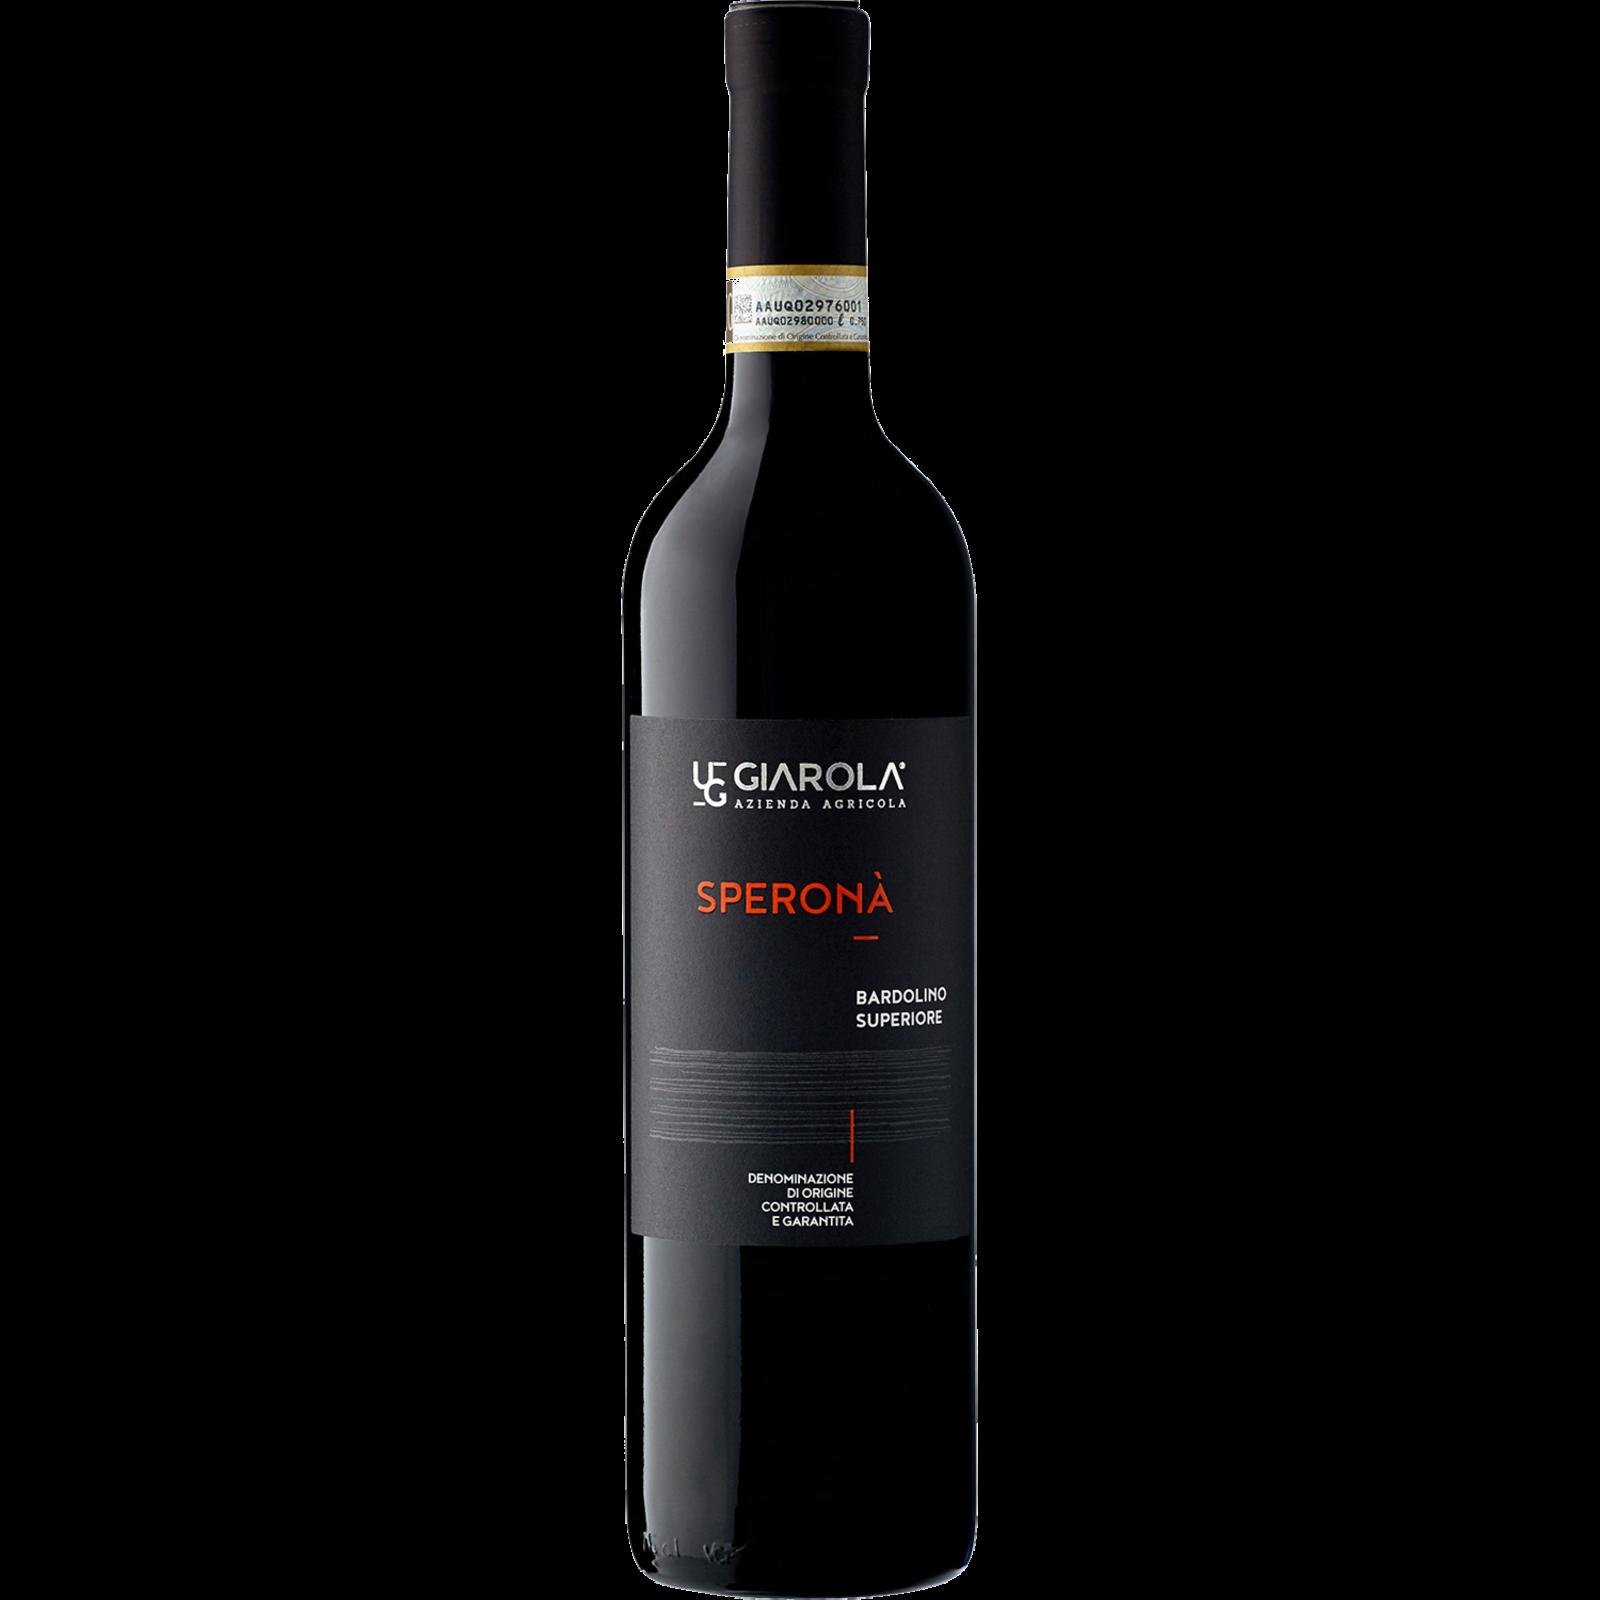 Vini Giarola Giarola Sperona  Bardolino Superiore 2018